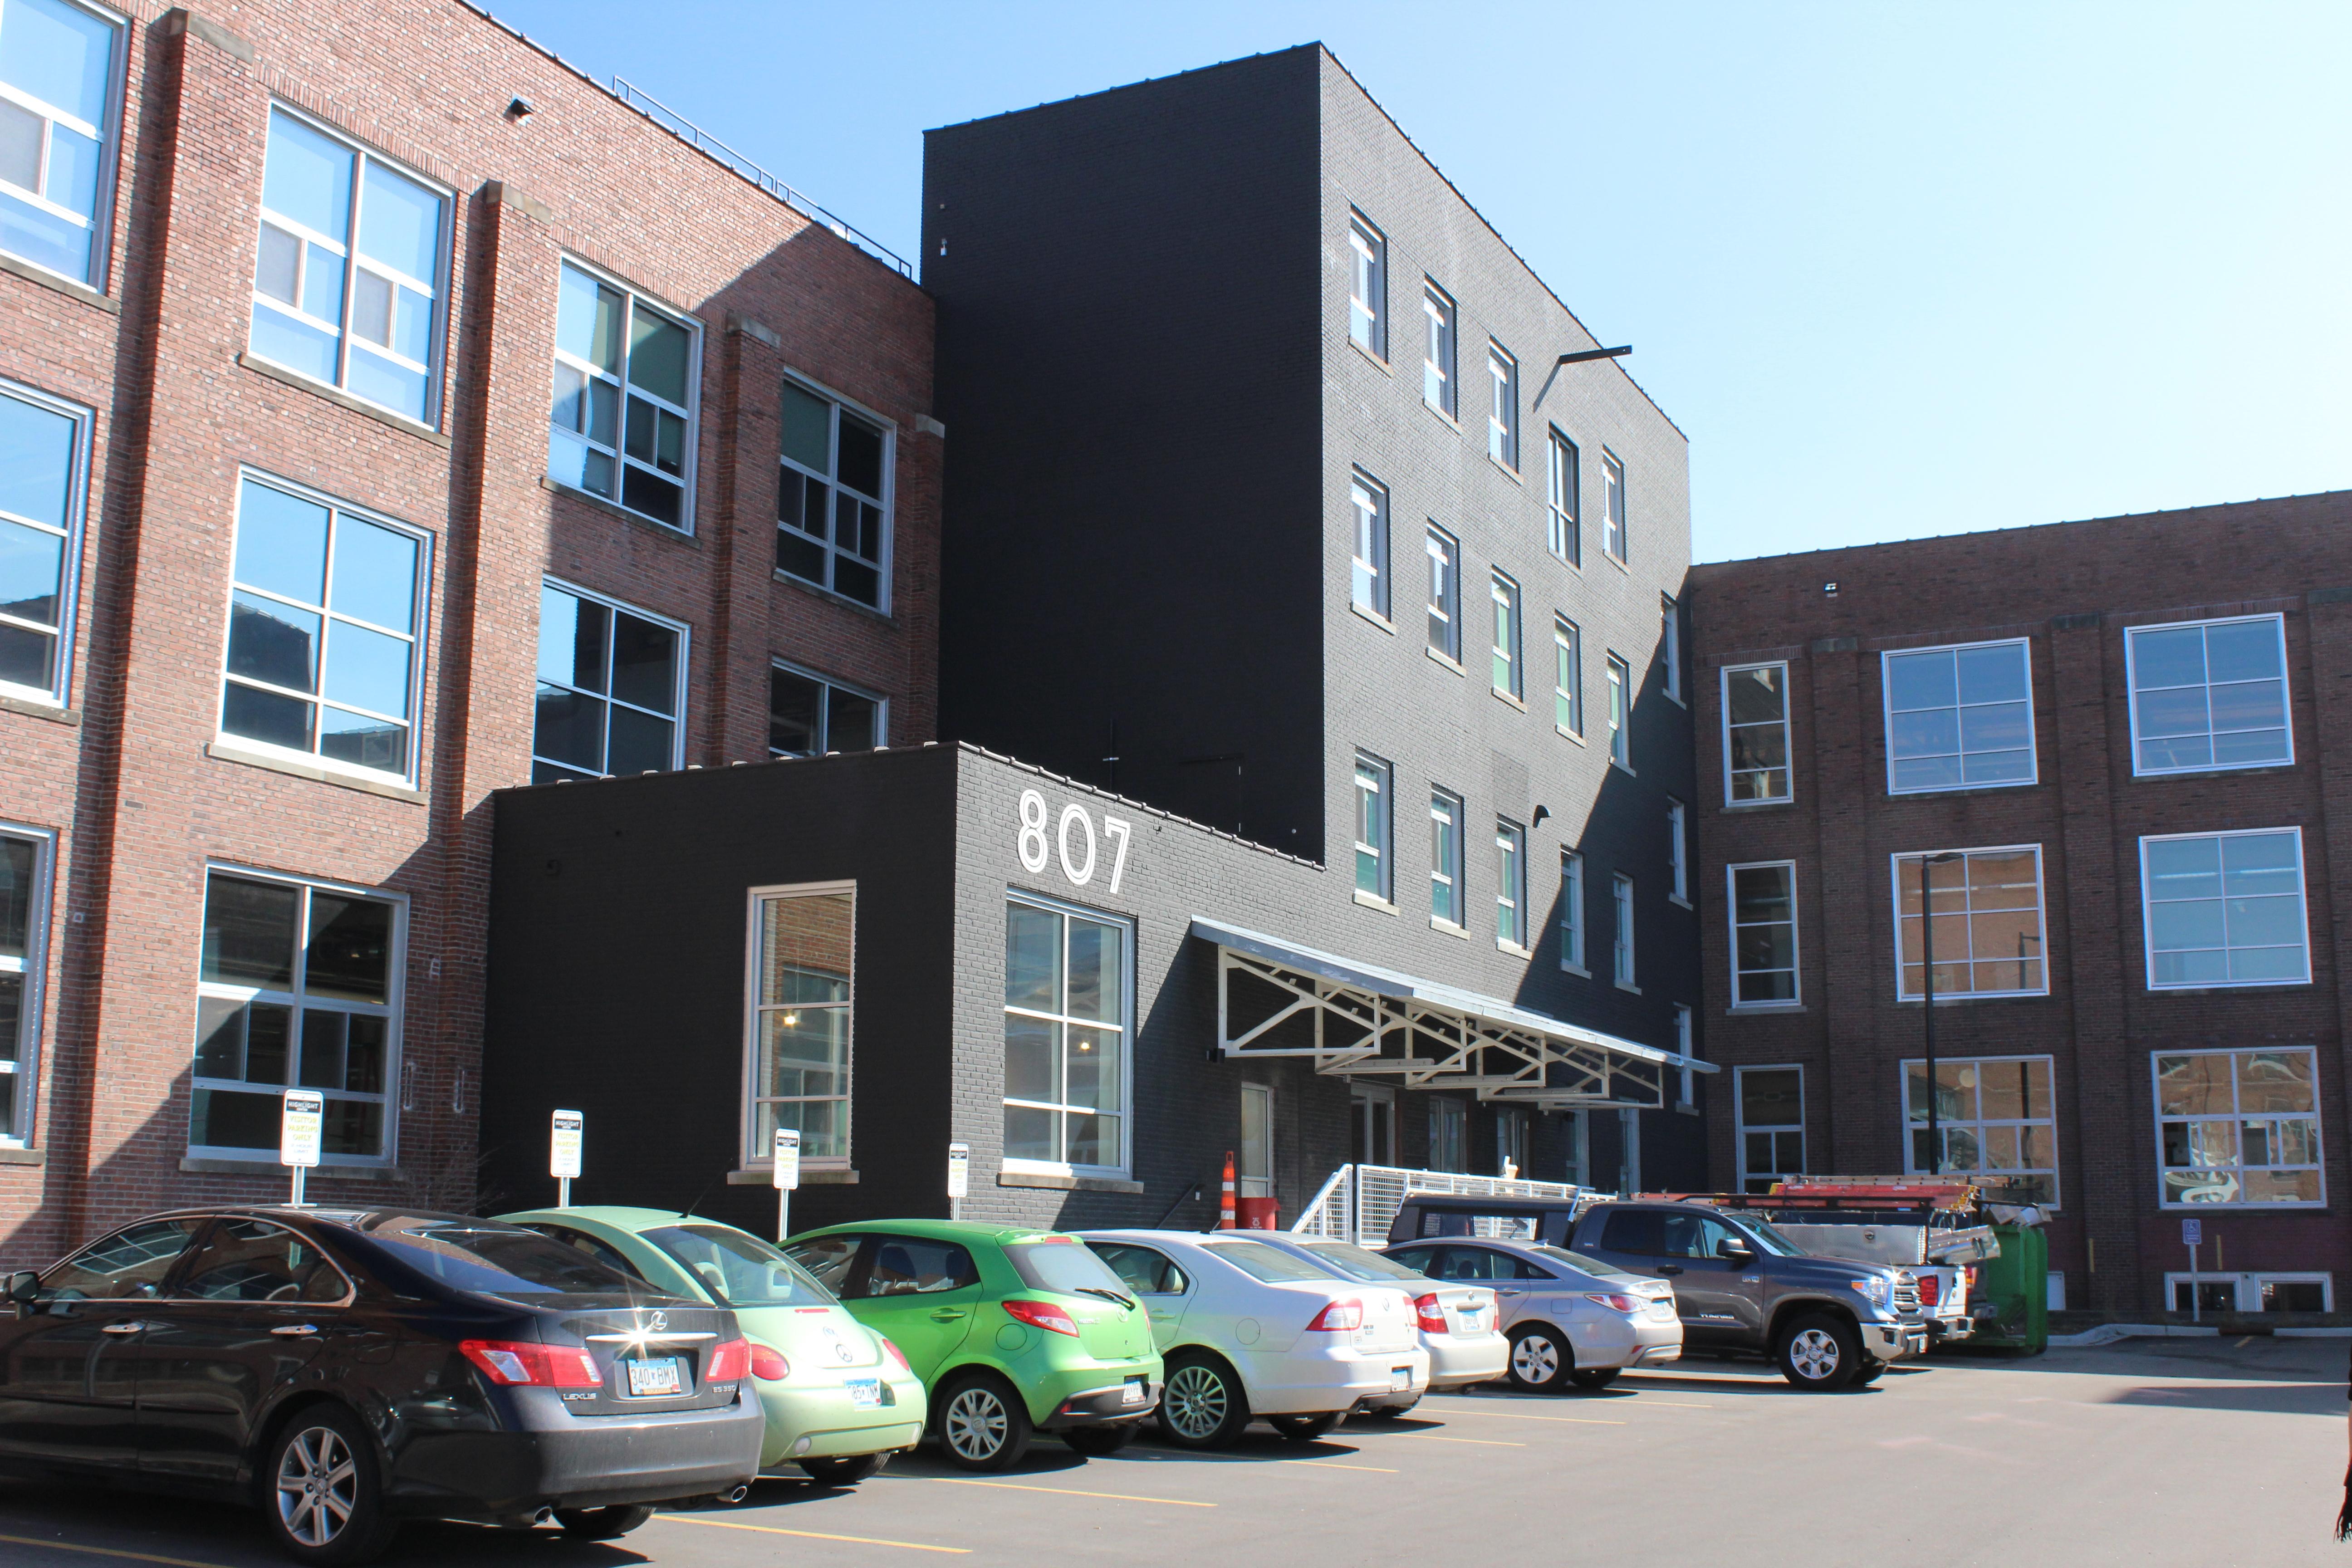 807 Building Exterior